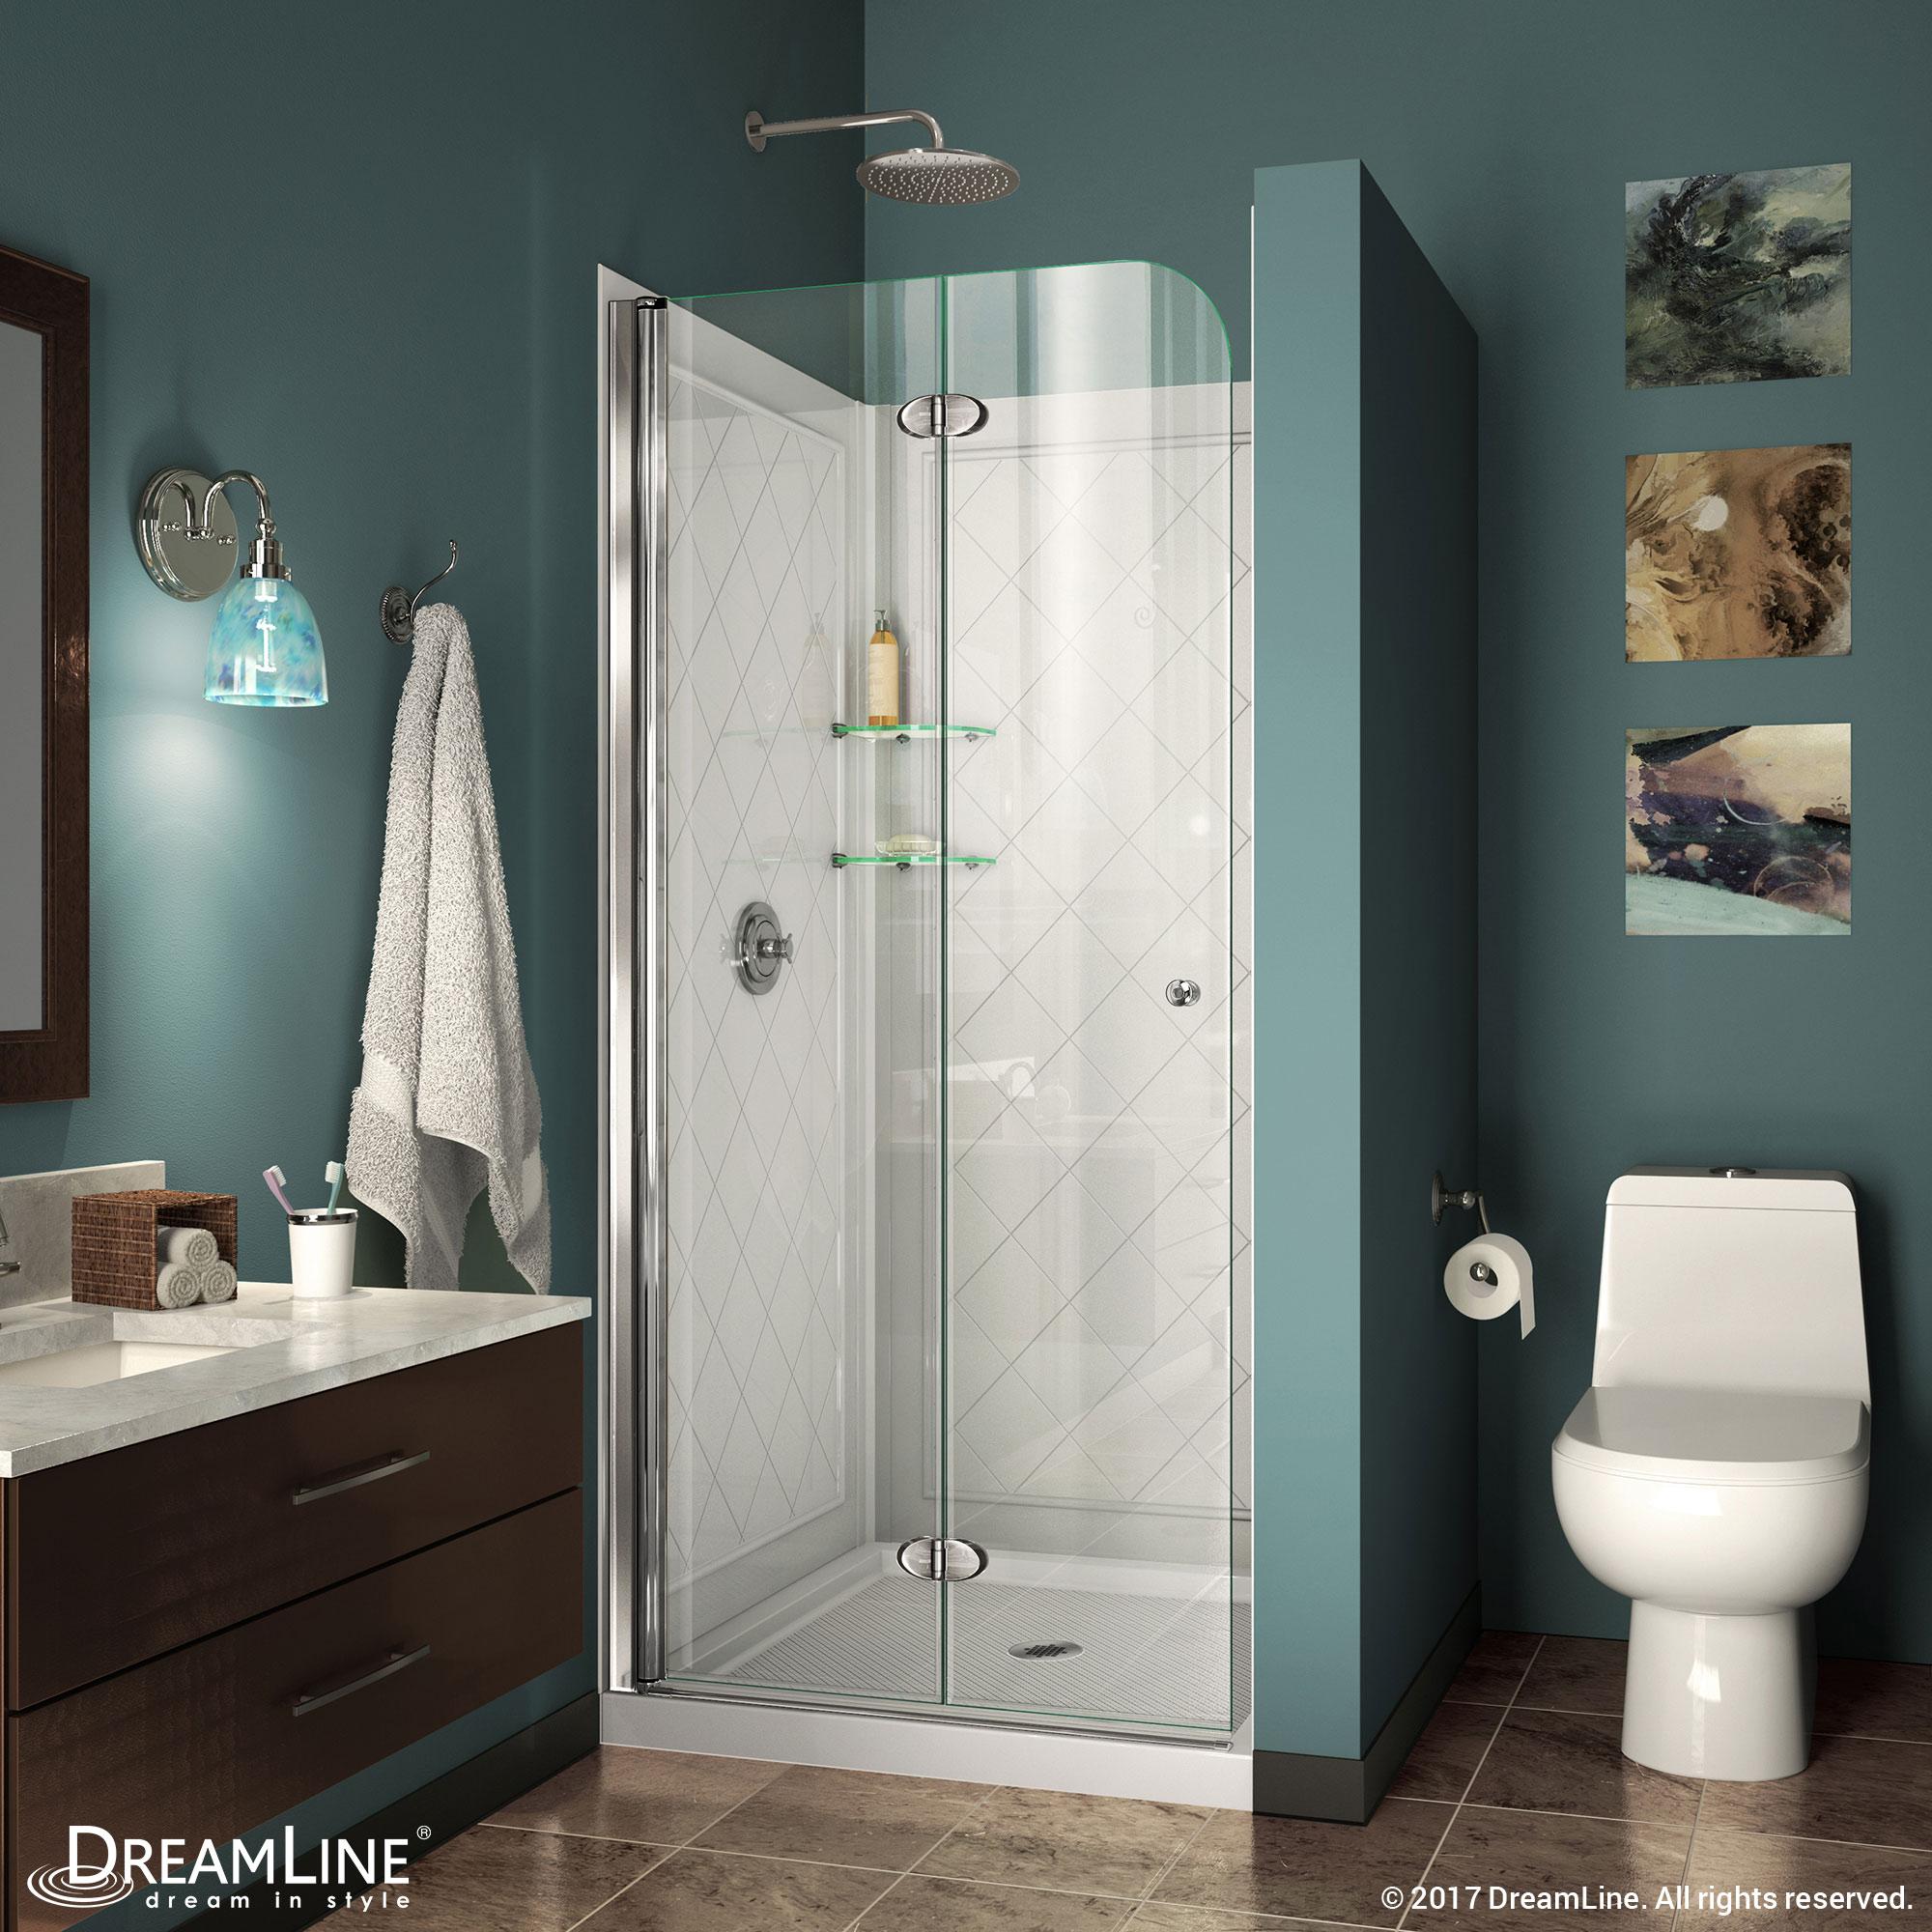 DreamLine Aqua Fold 36 in. W x 58 in. H Frameless Bi-Fold Tub Door in Chrome